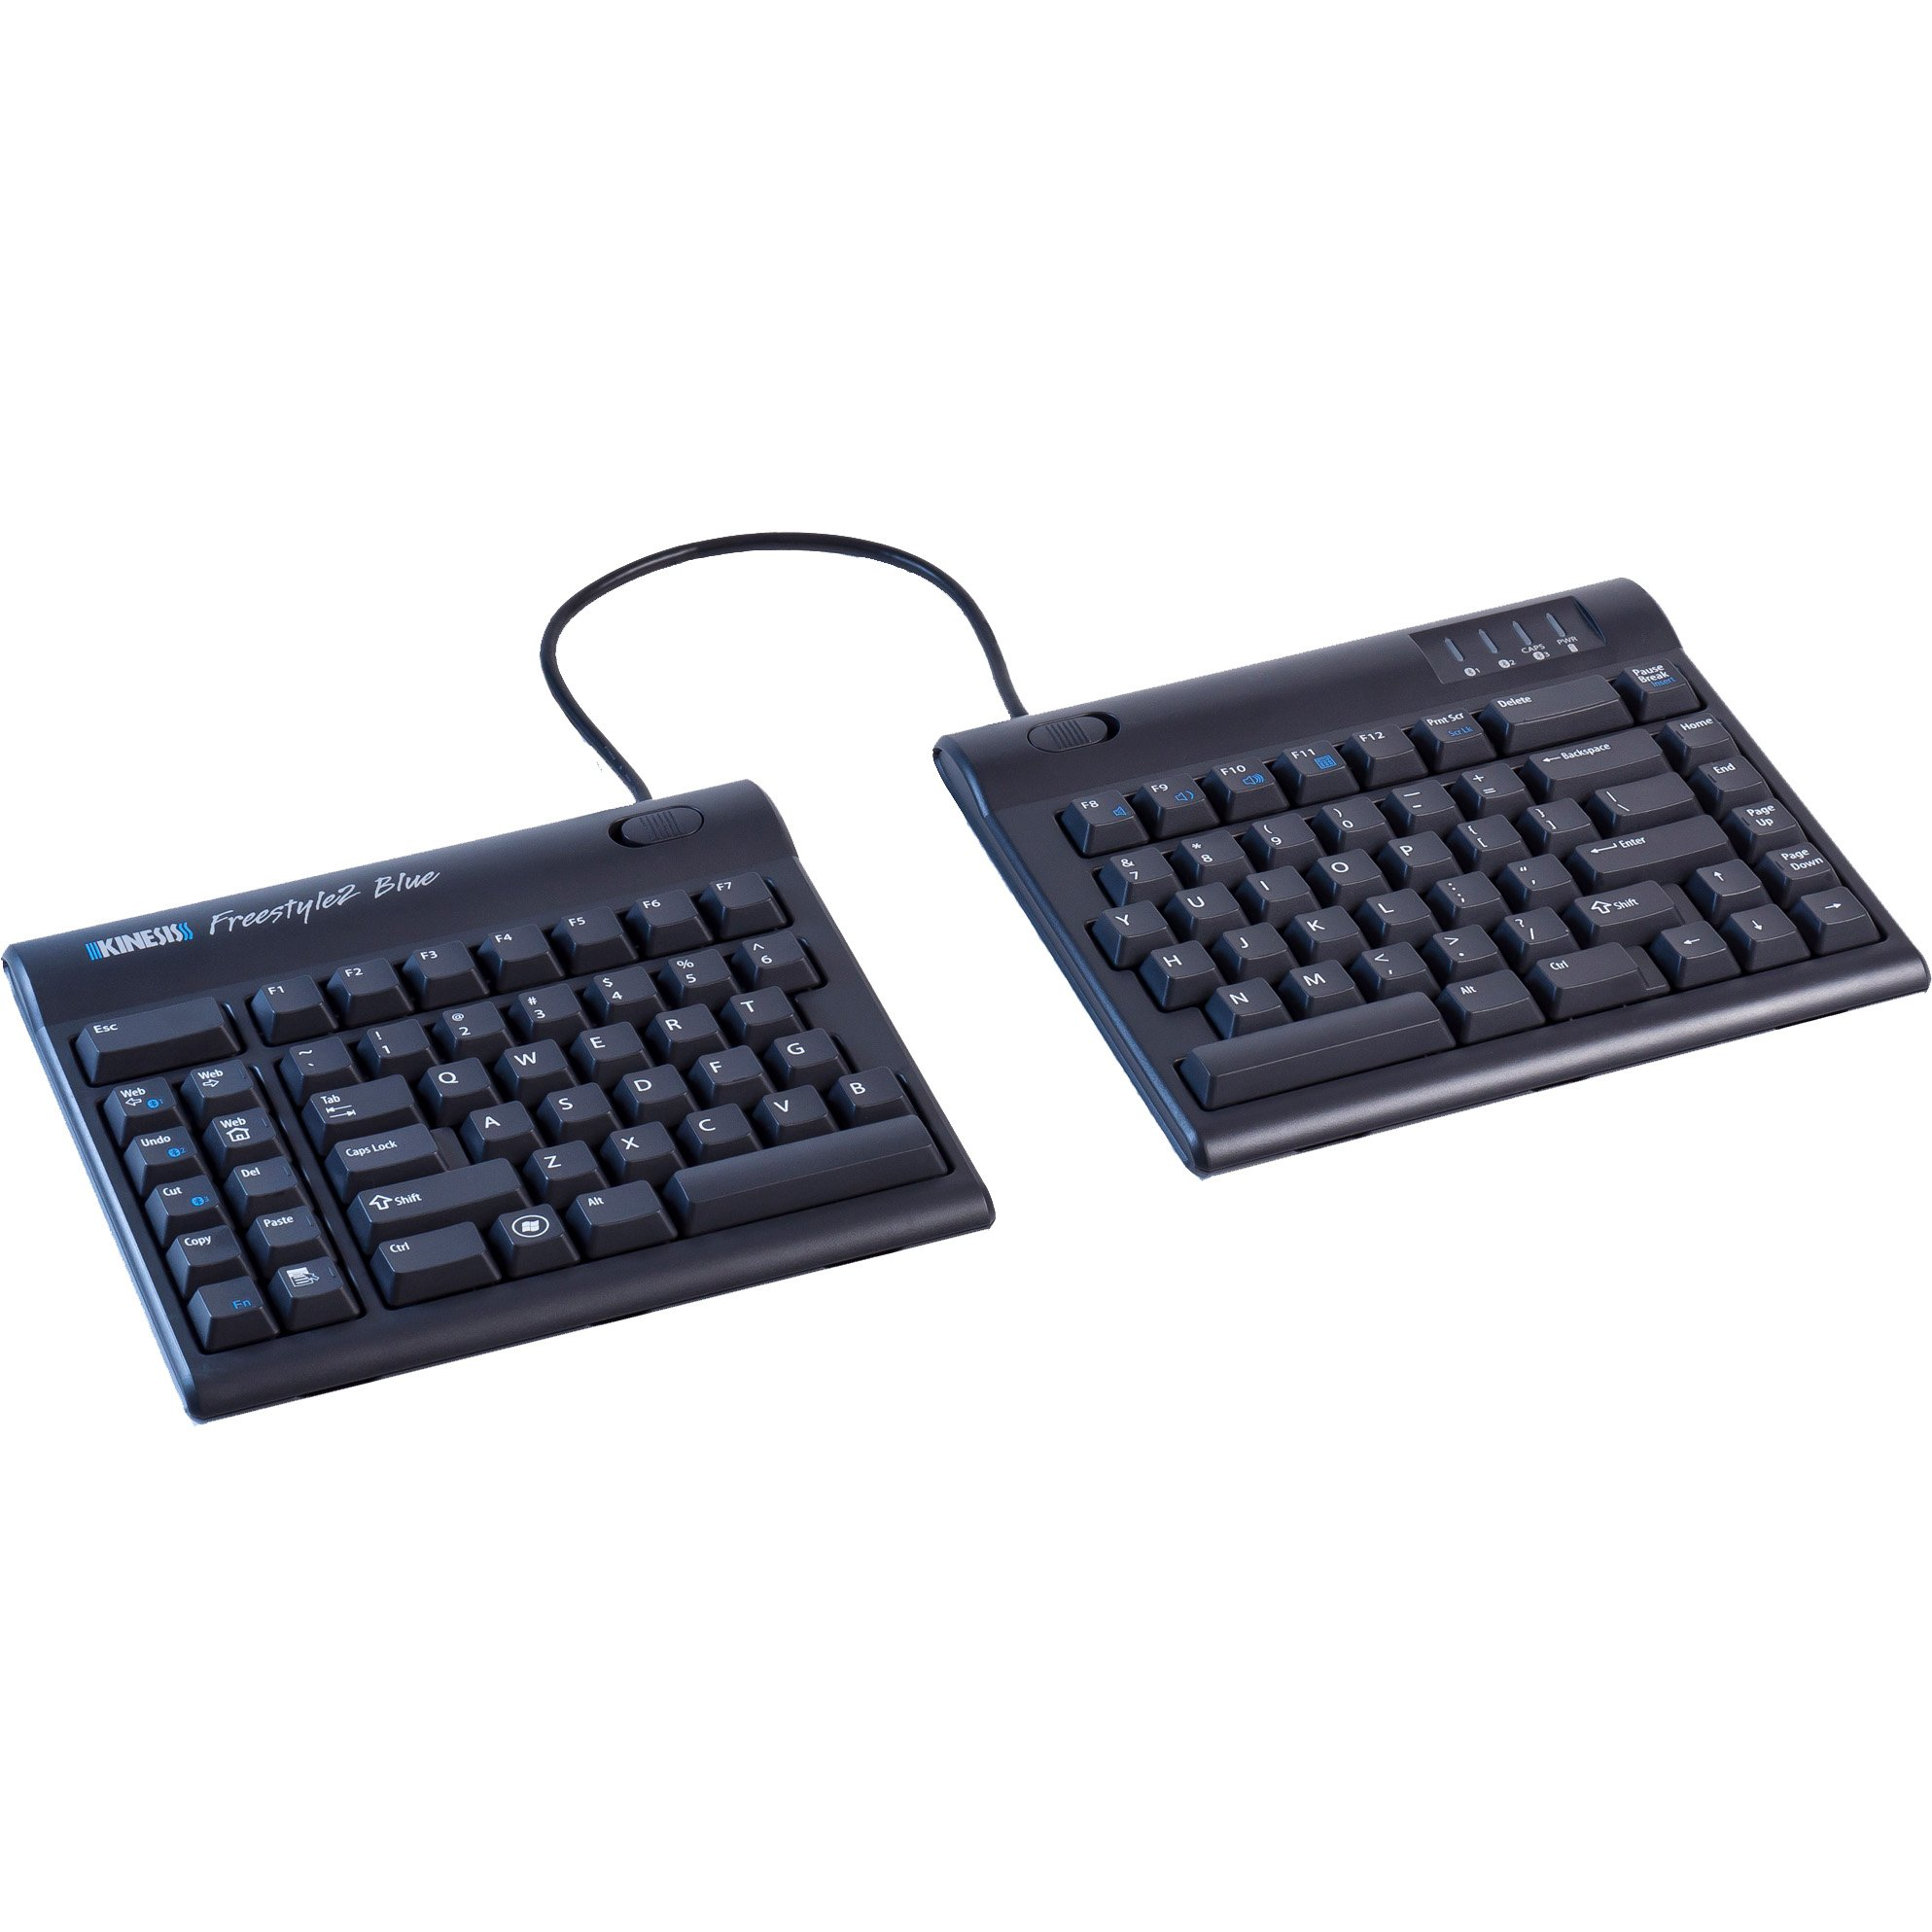 Kinesis Freestyle2 Blue Wireless Ergonomic Keyboard for PC (9'' Separation)